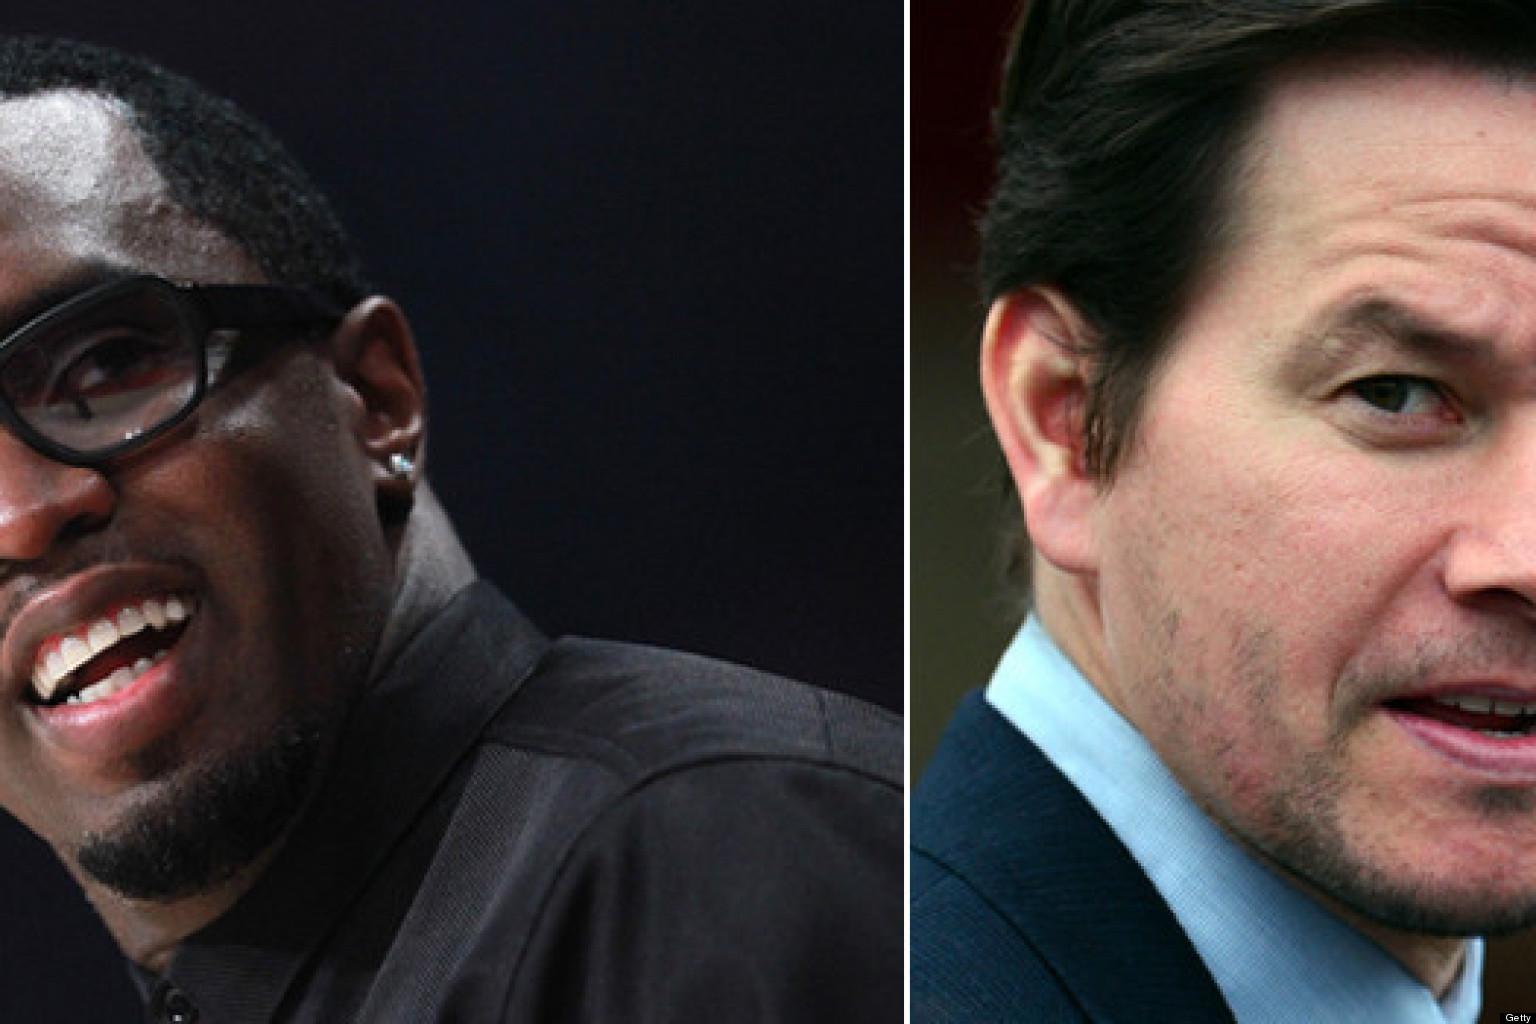 Sean Combs, Mark Wahlberg Water: AQUAhydrate Promises To ... Mark Wahlberg Racist